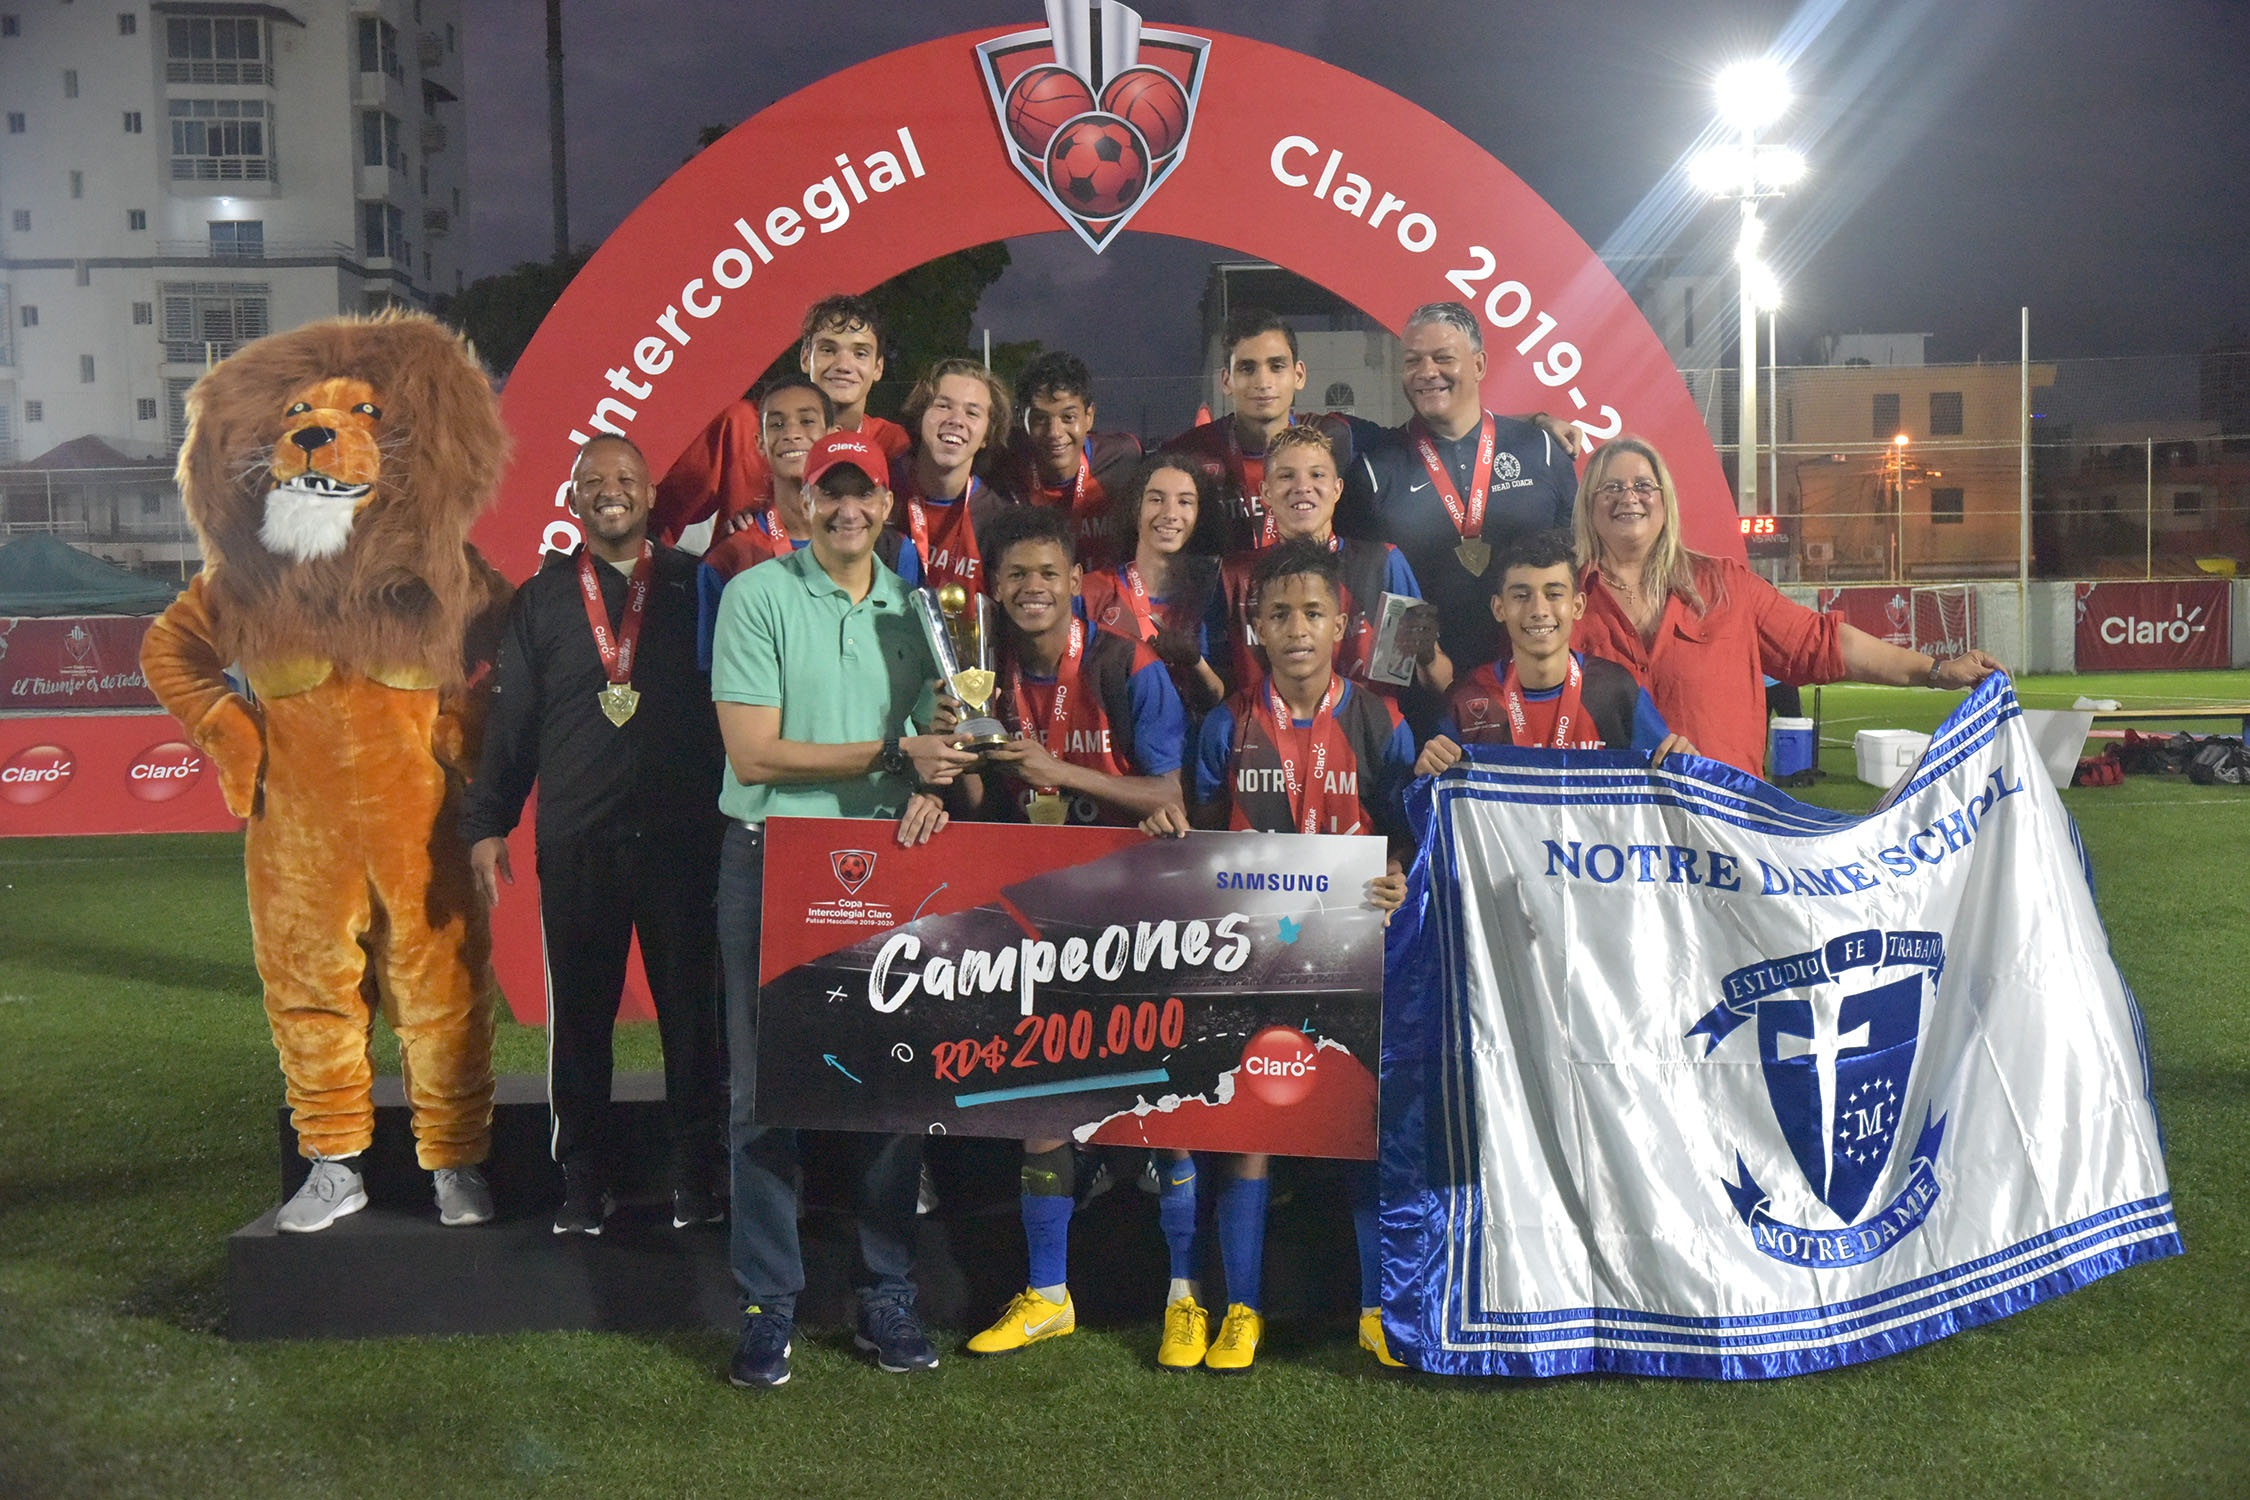 Notre Dame revalida su trono en la Copa Futsal masculino